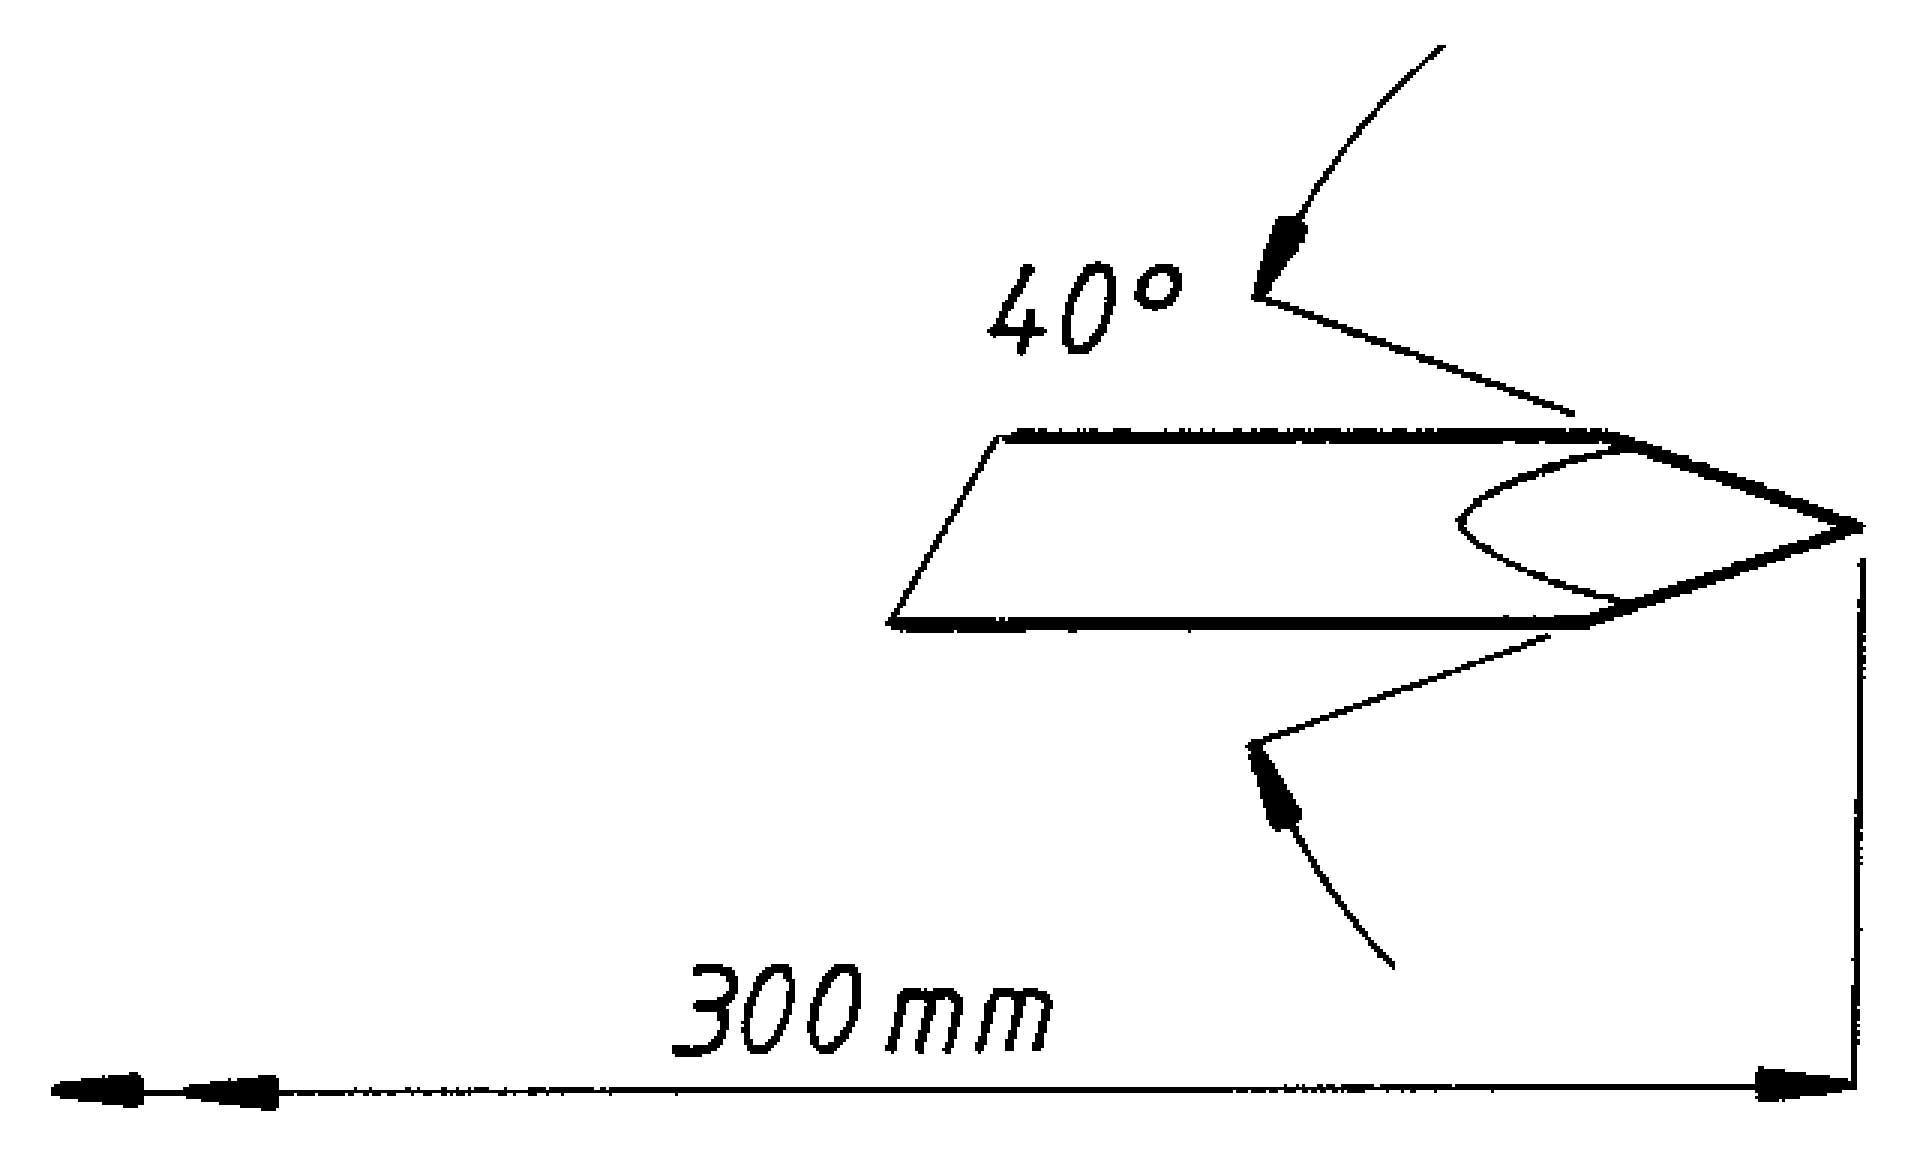 Steinman Intra-Medullary Pins